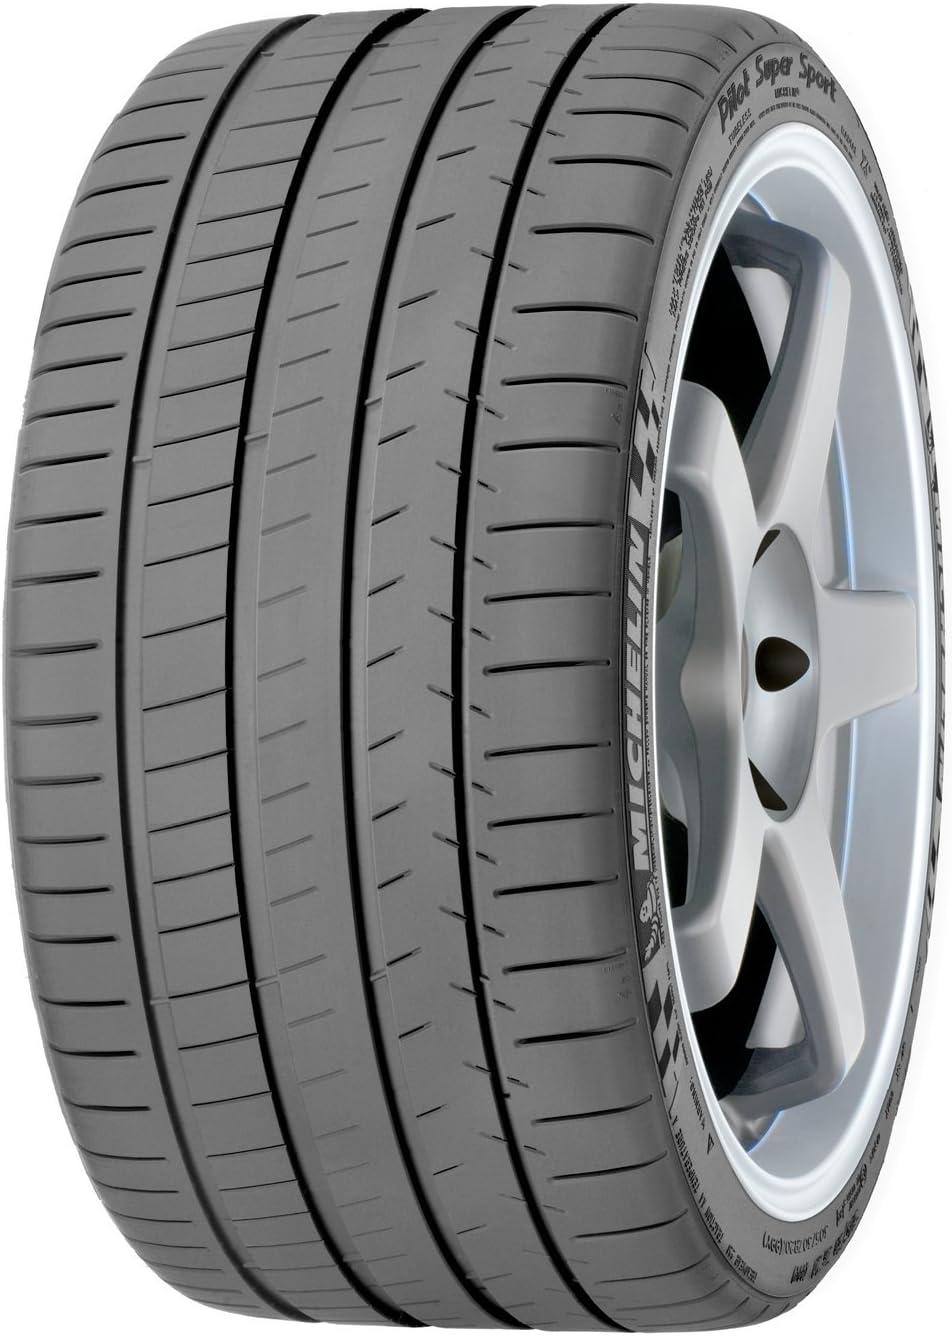 Michelin Pilot Super Sport El Fsl 245 35r18 92y Sommerreifen Auto